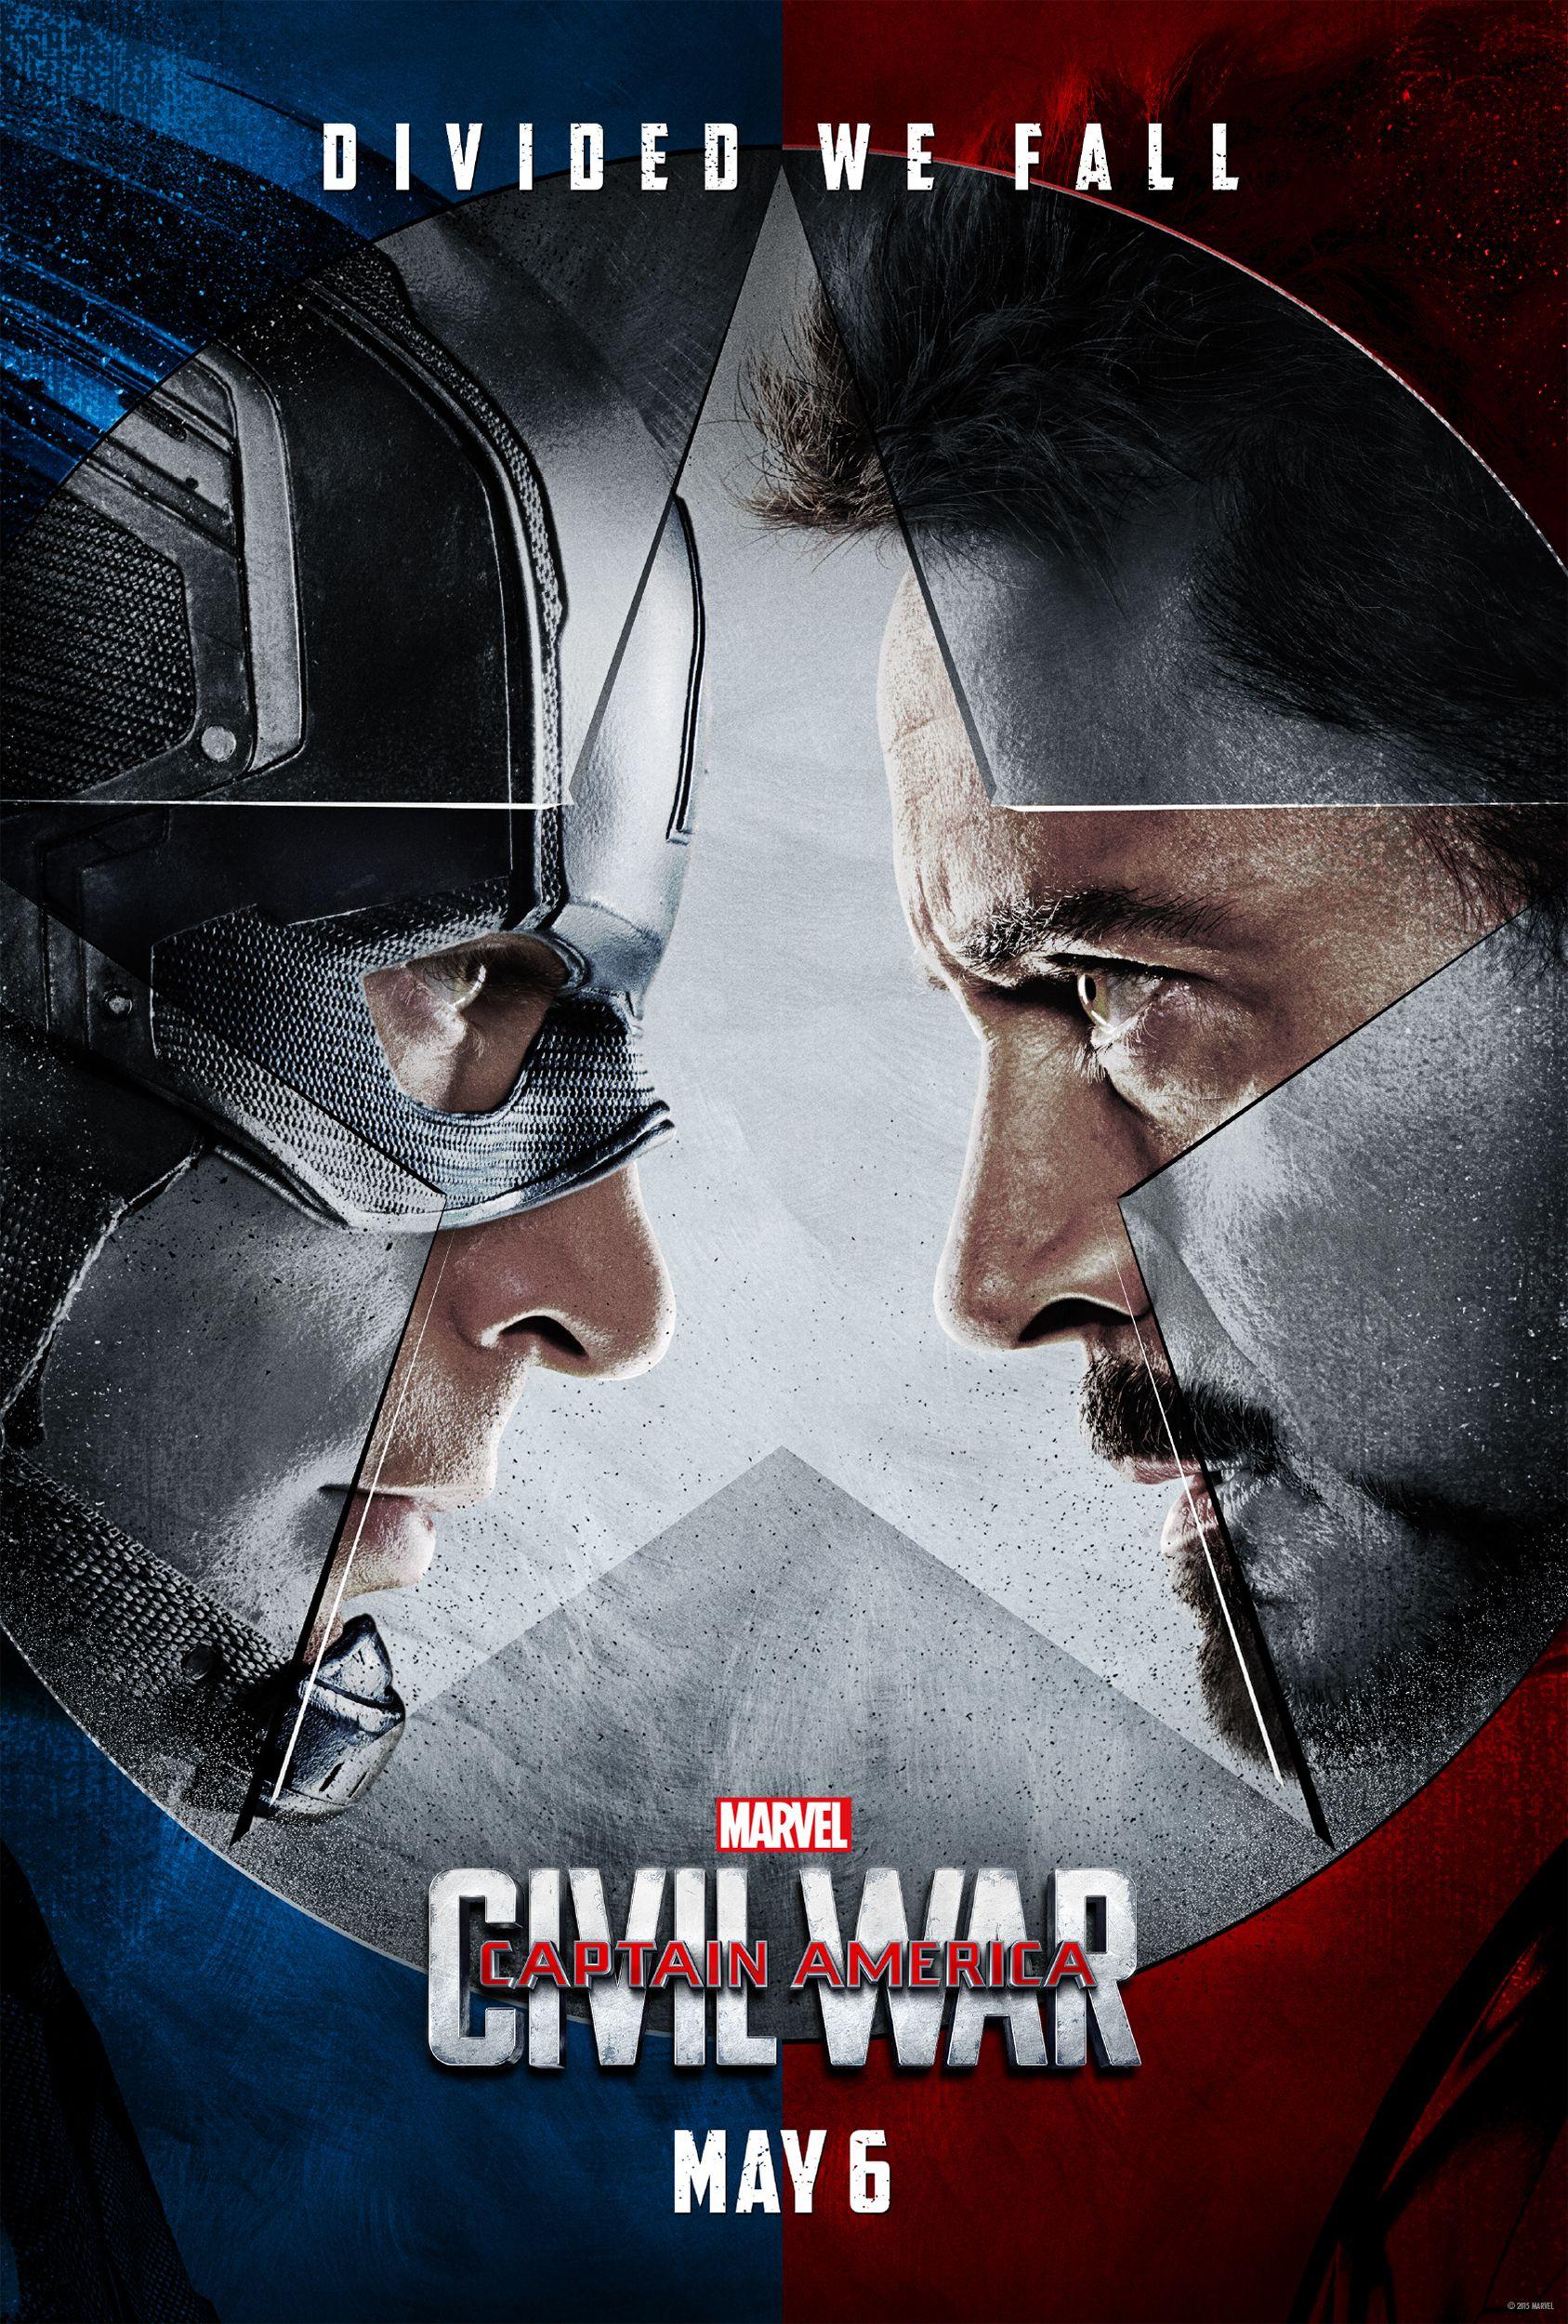 captain america civil war posters make the fight personal collider. Black Bedroom Furniture Sets. Home Design Ideas